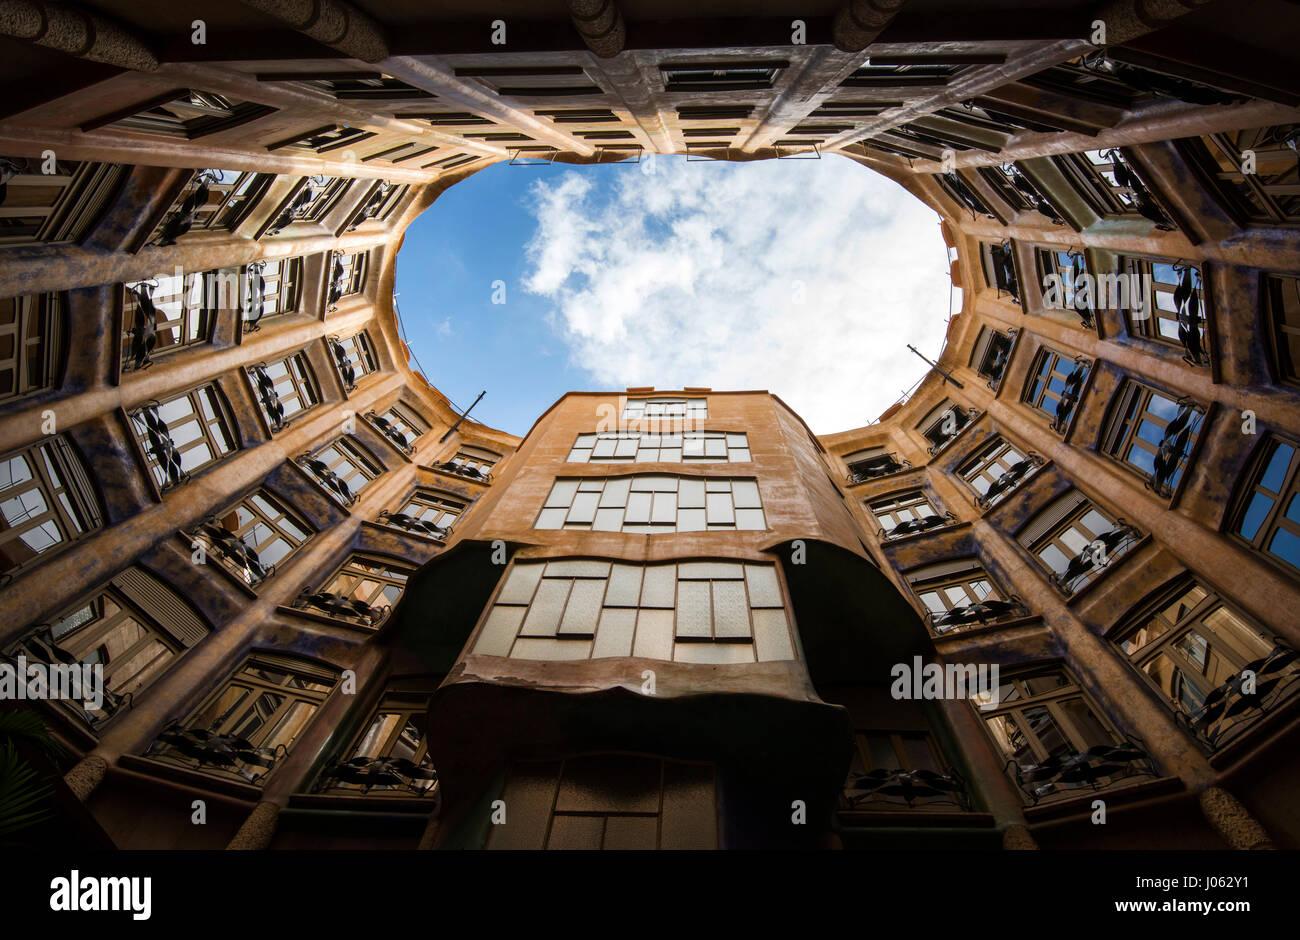 Looking up from an inner courtyard inside Casa Mila (La Pedrera) in Barcelona, Spain Europe EU - Stock Image